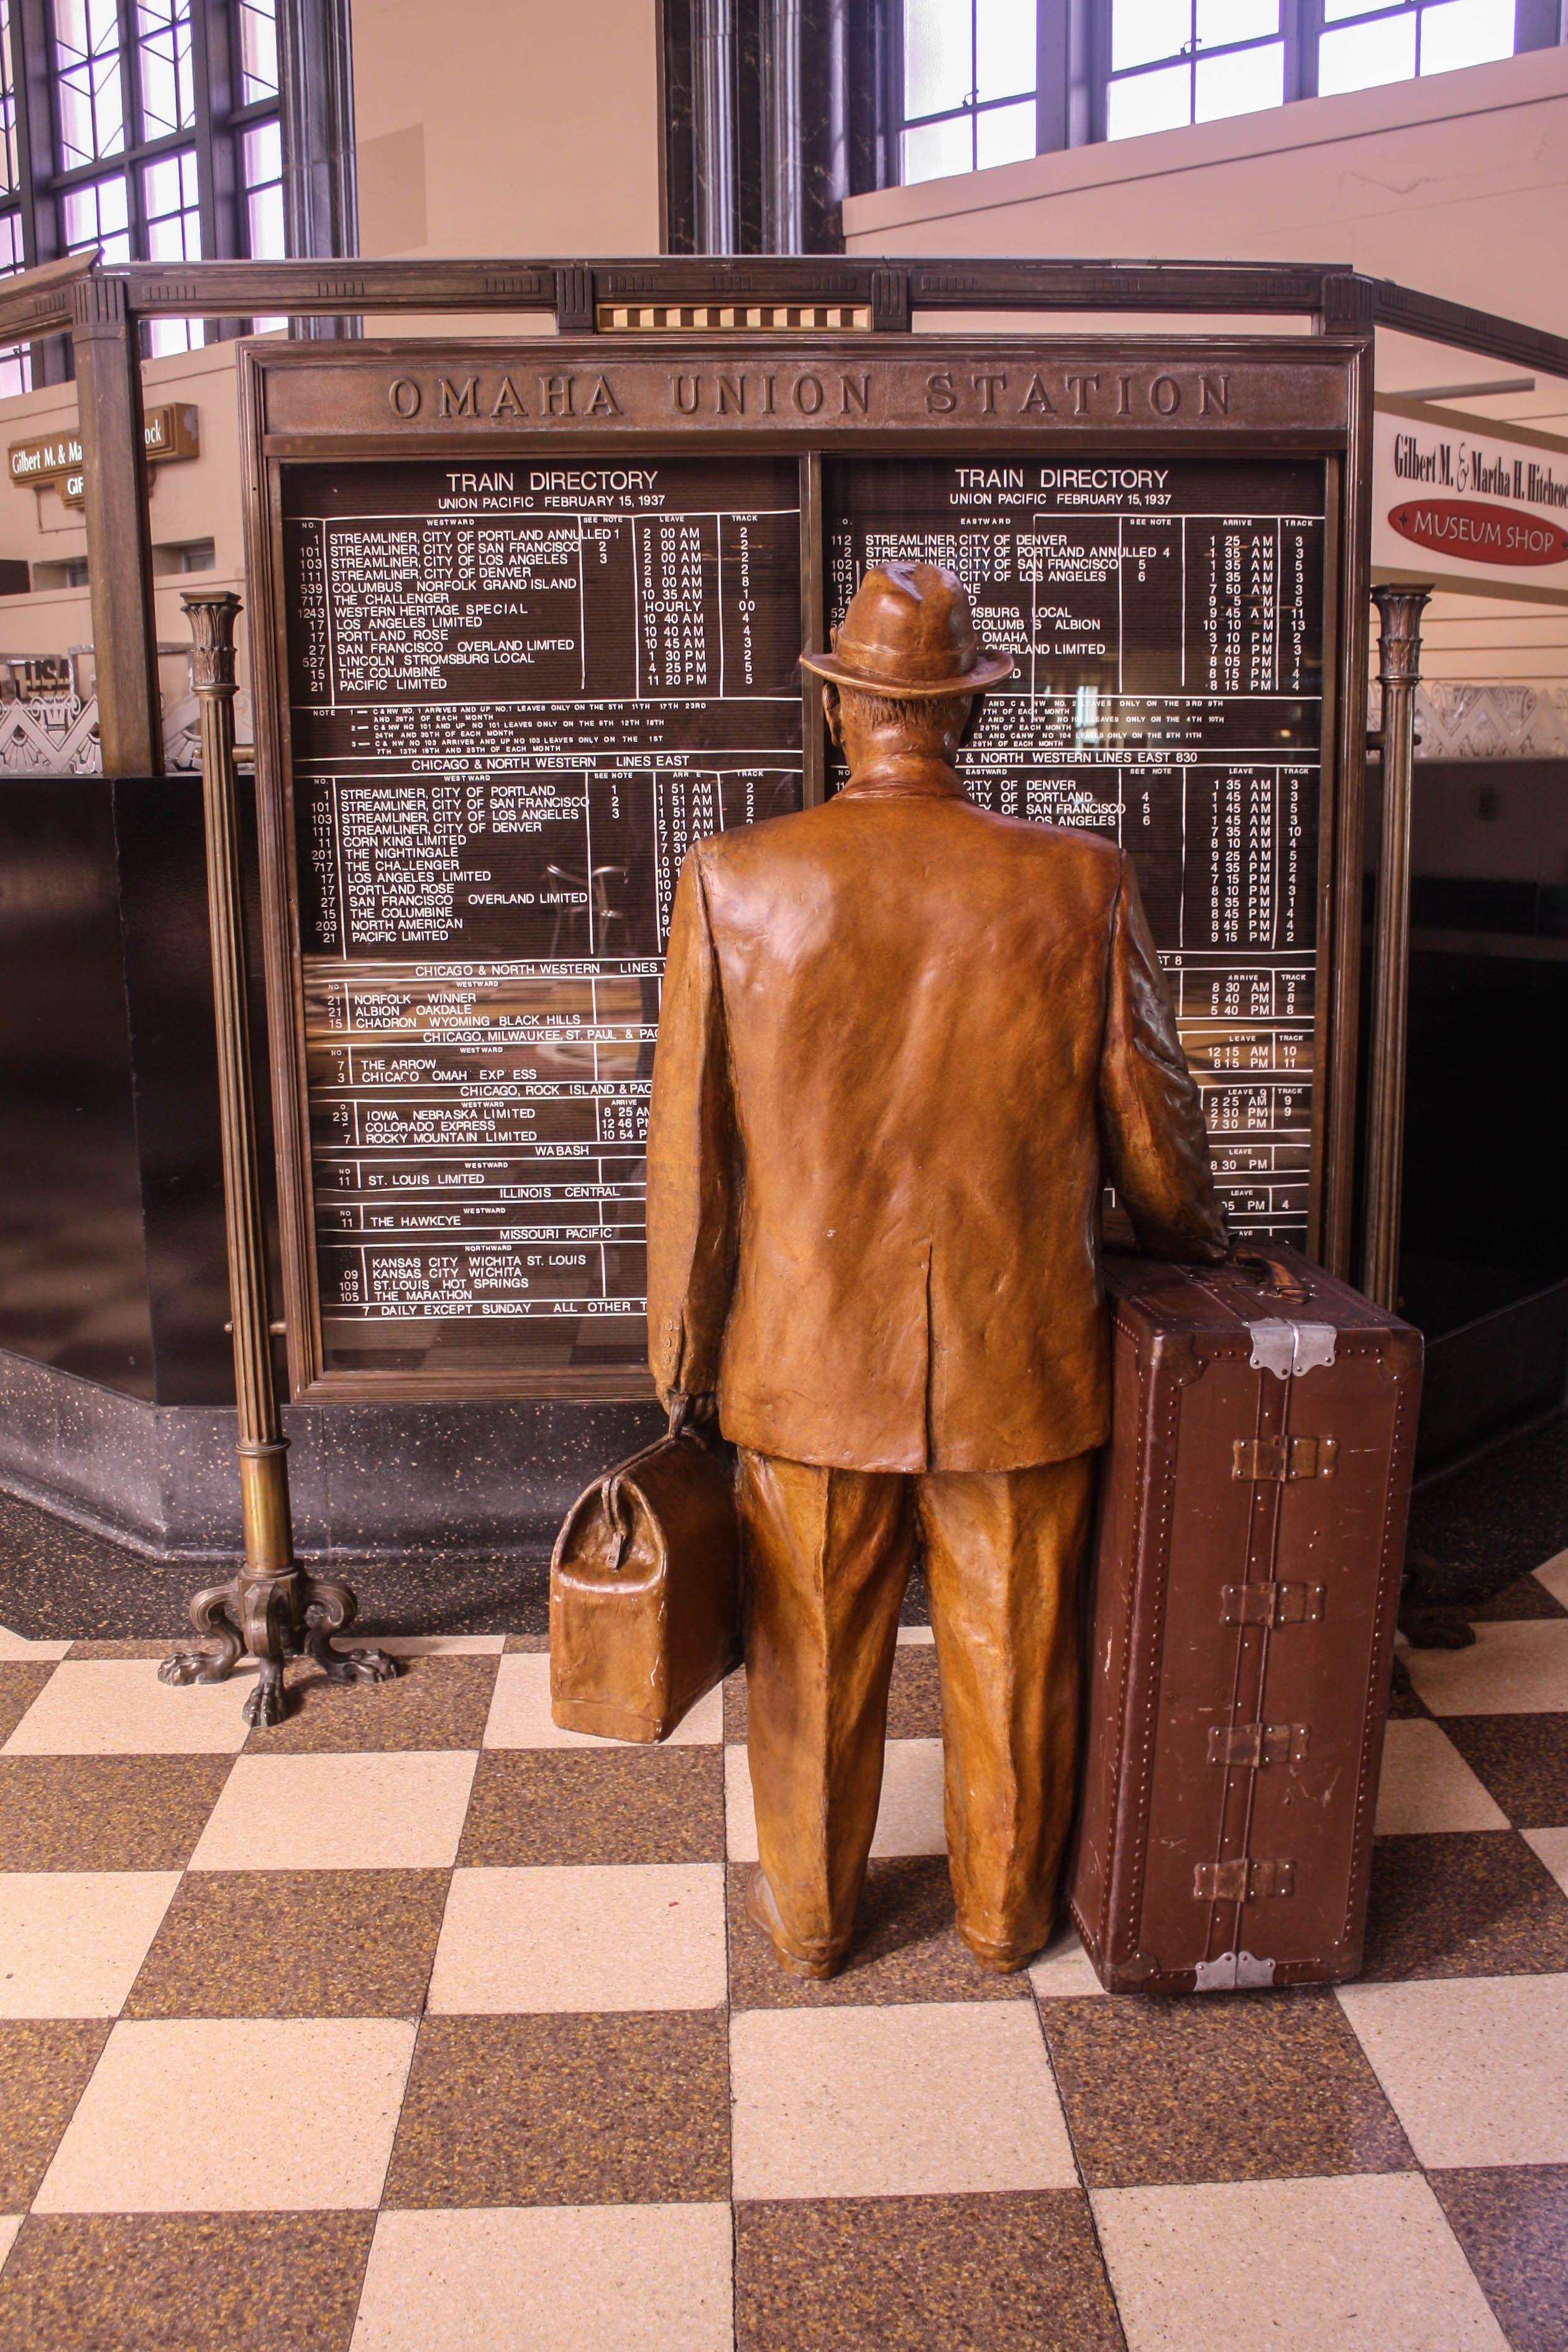 Union Station, Omaha, Nebraska Union station, Train